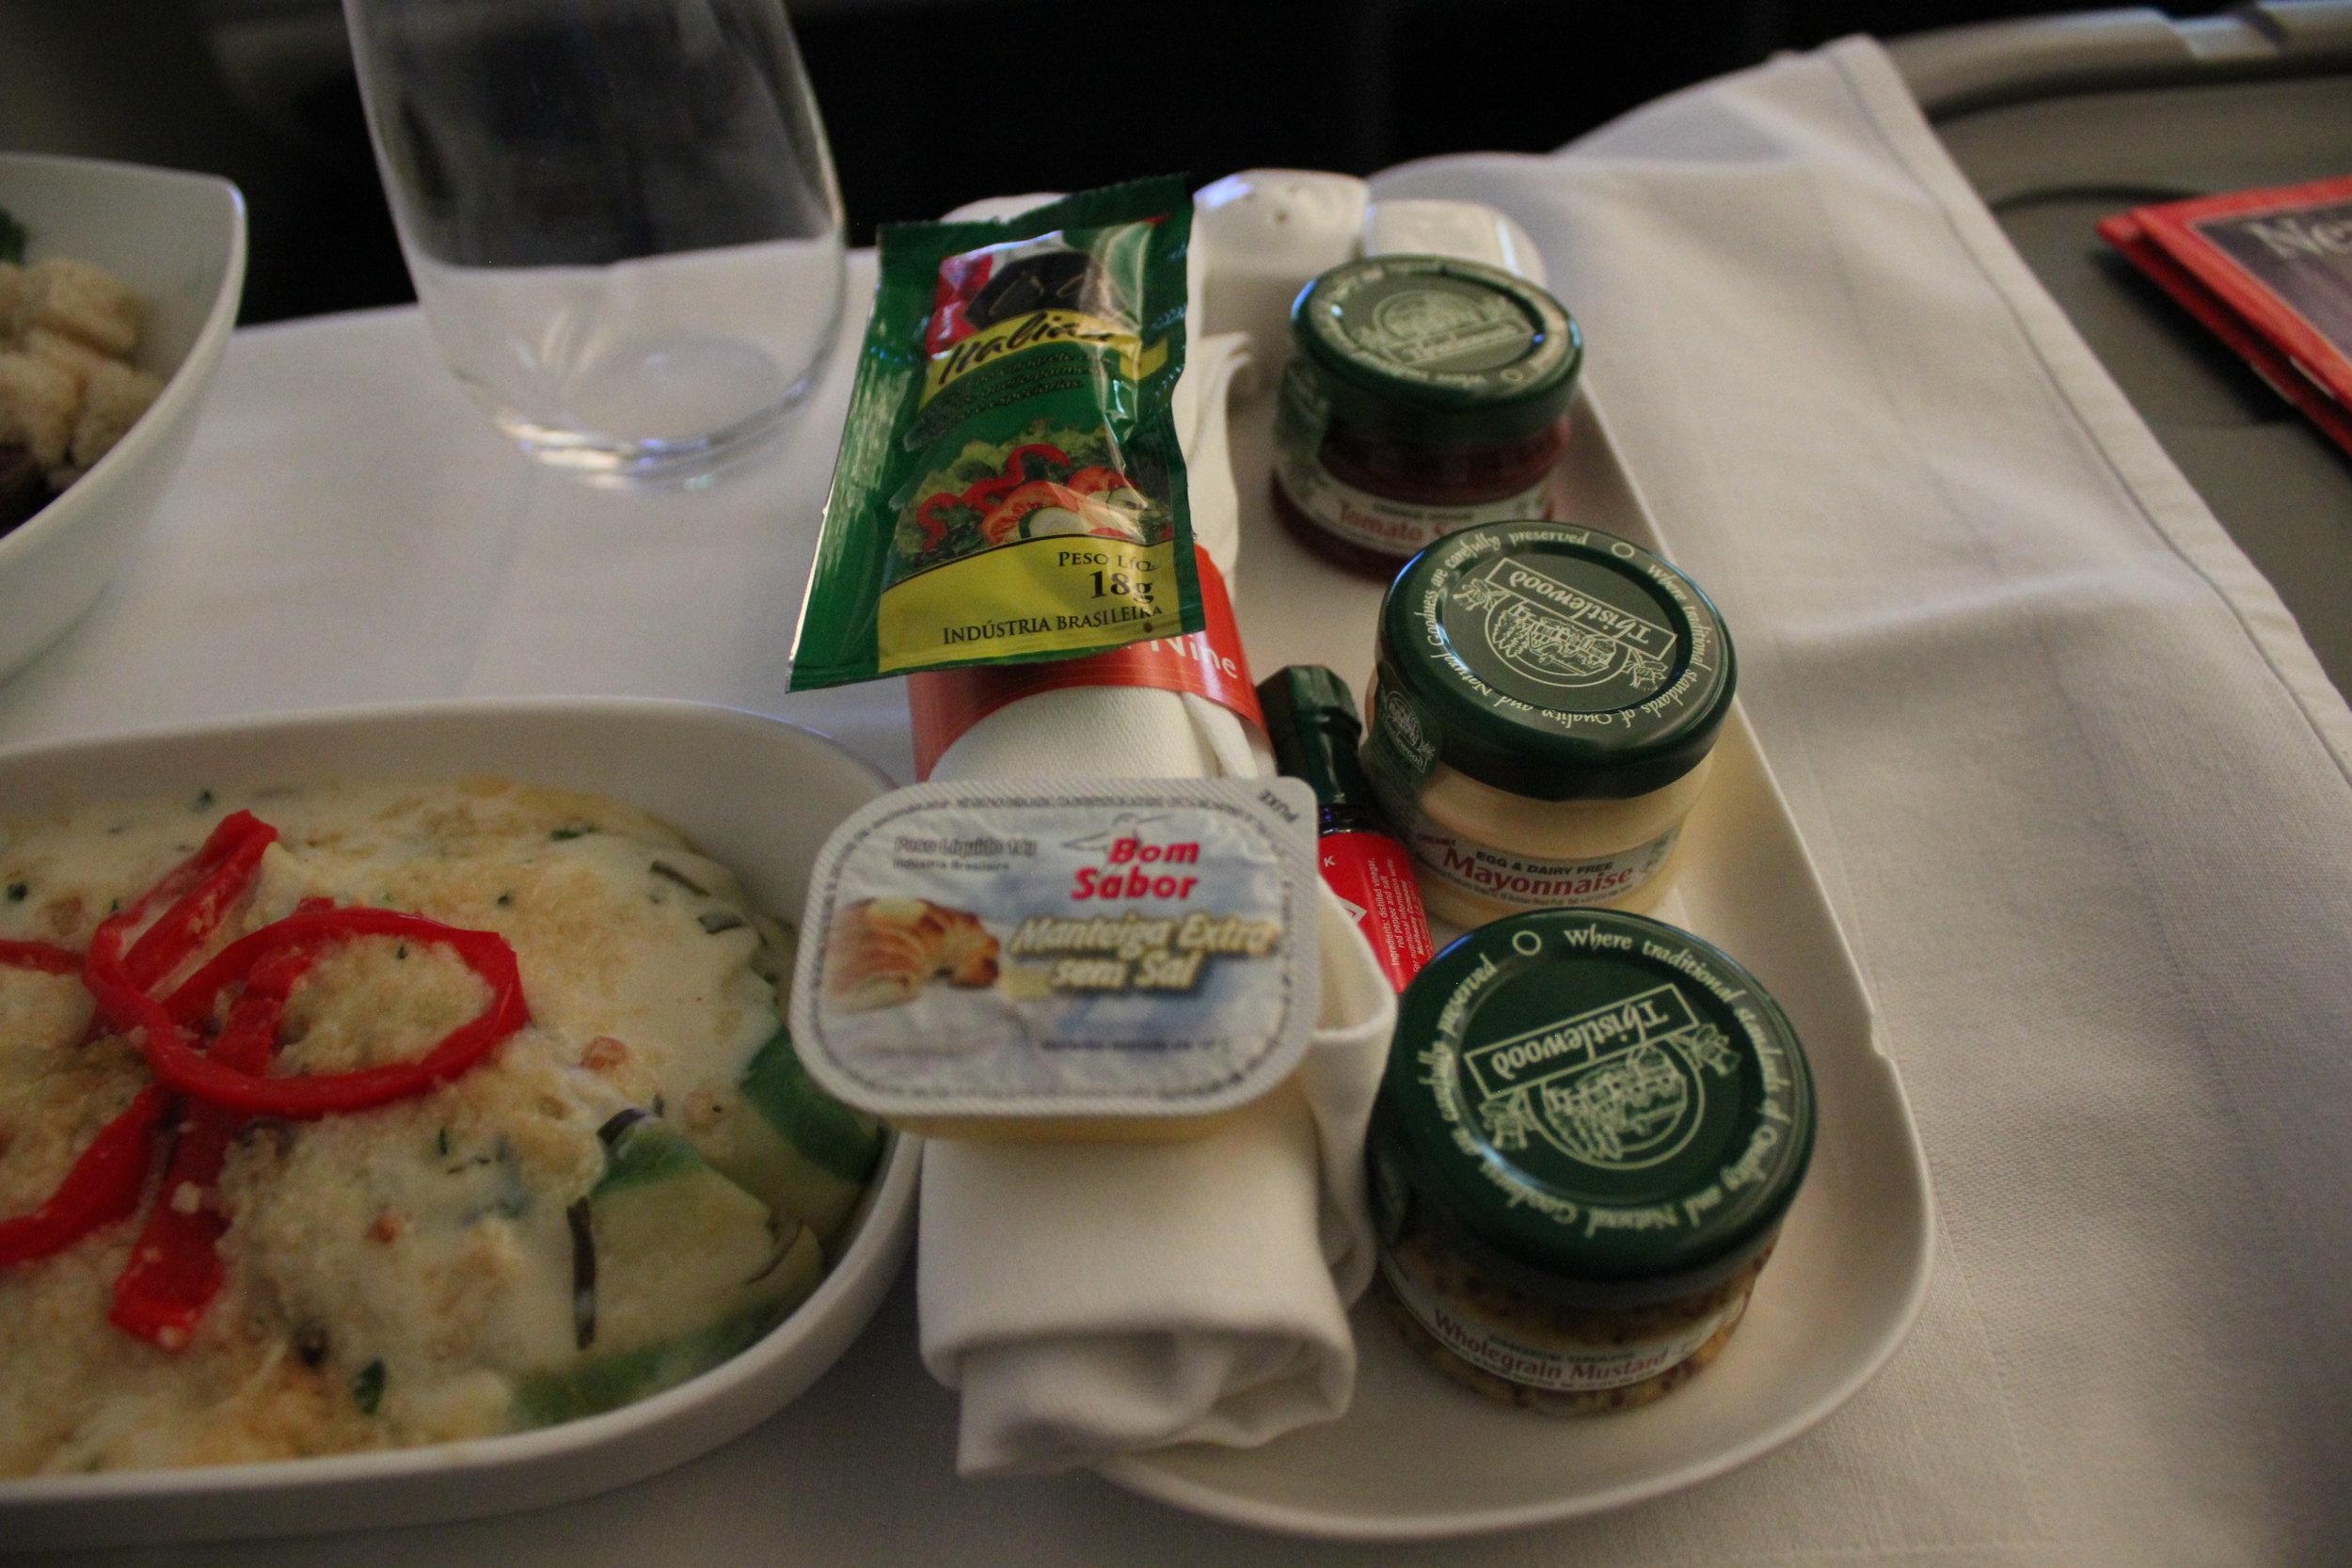 Ethiopian Airlines business class – Condiments